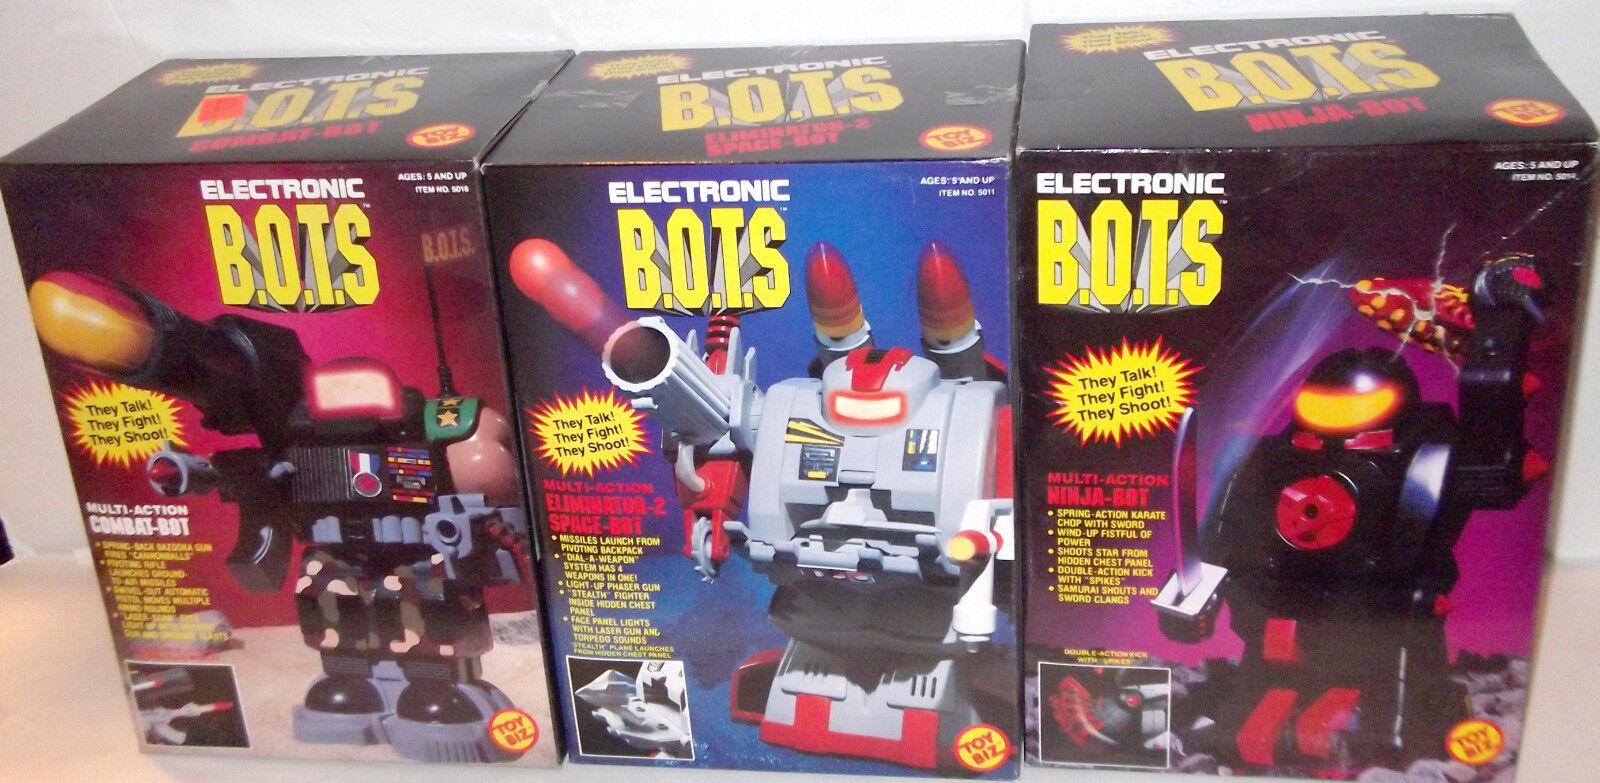 ✰ LOT of 3 ✰ Electronic B.O.T.S Space-Bot Figure Vintage 1992 SEALED toybiz MISB